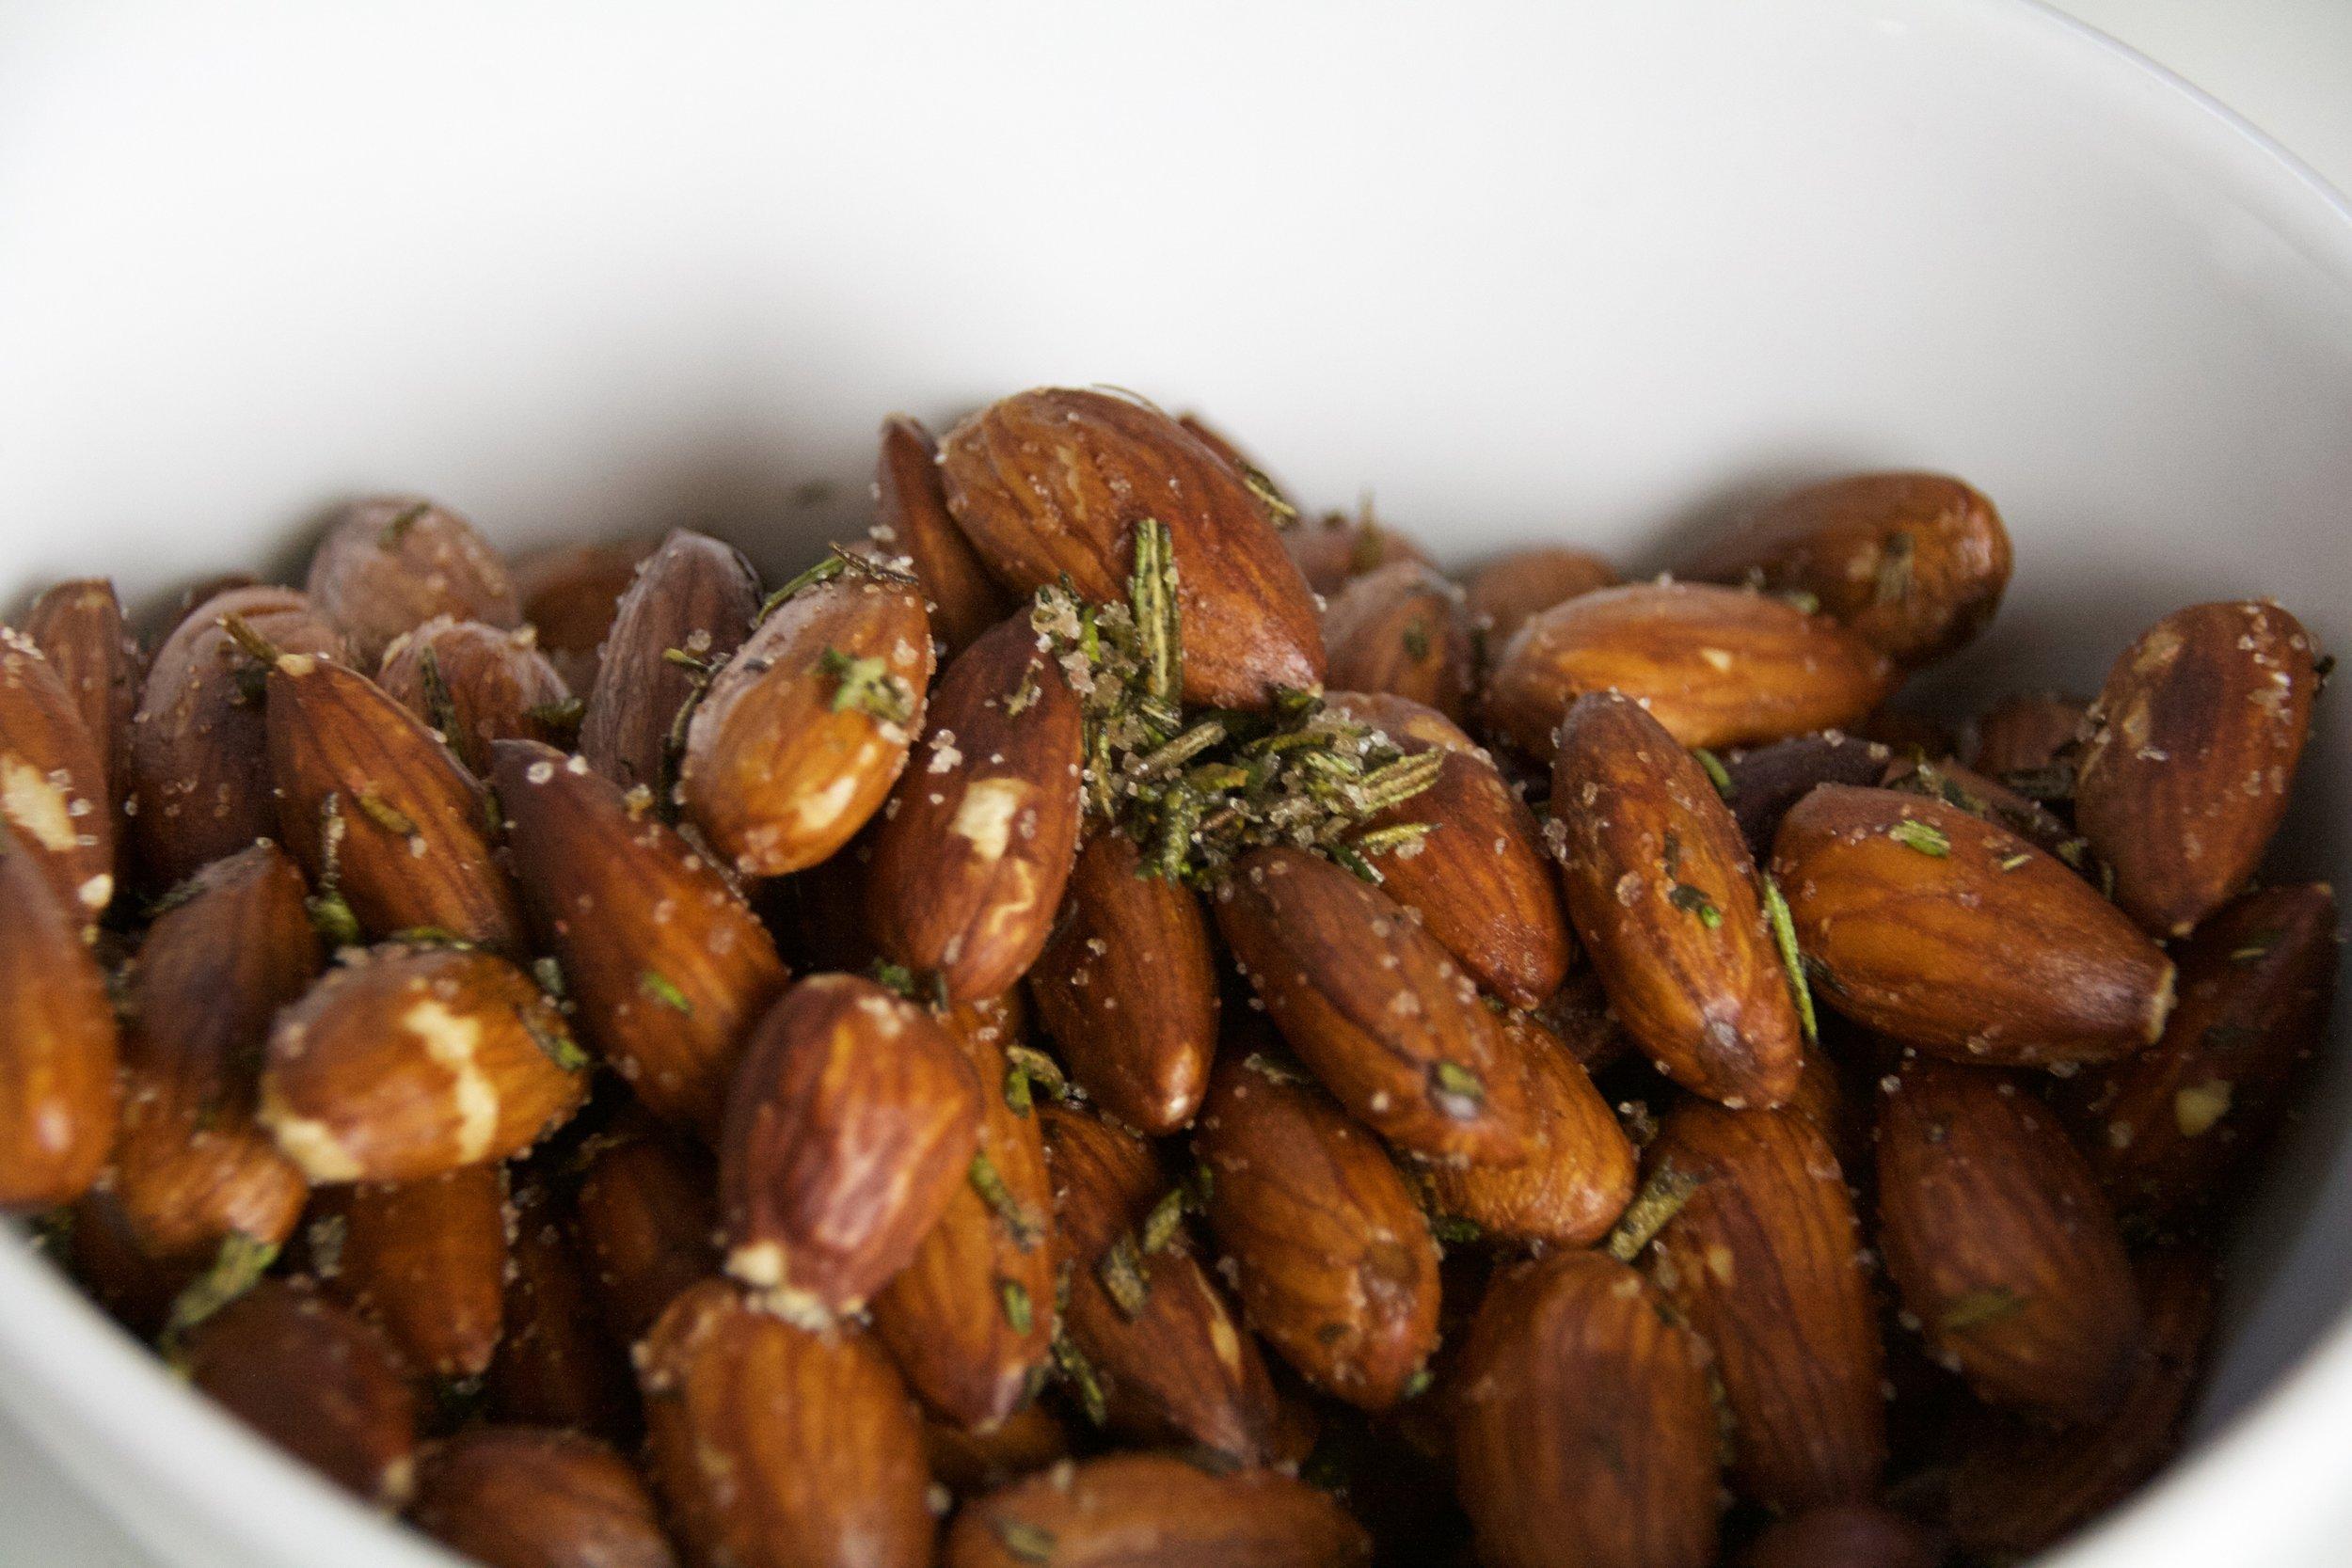 Rosemary Sea Salt Almonds